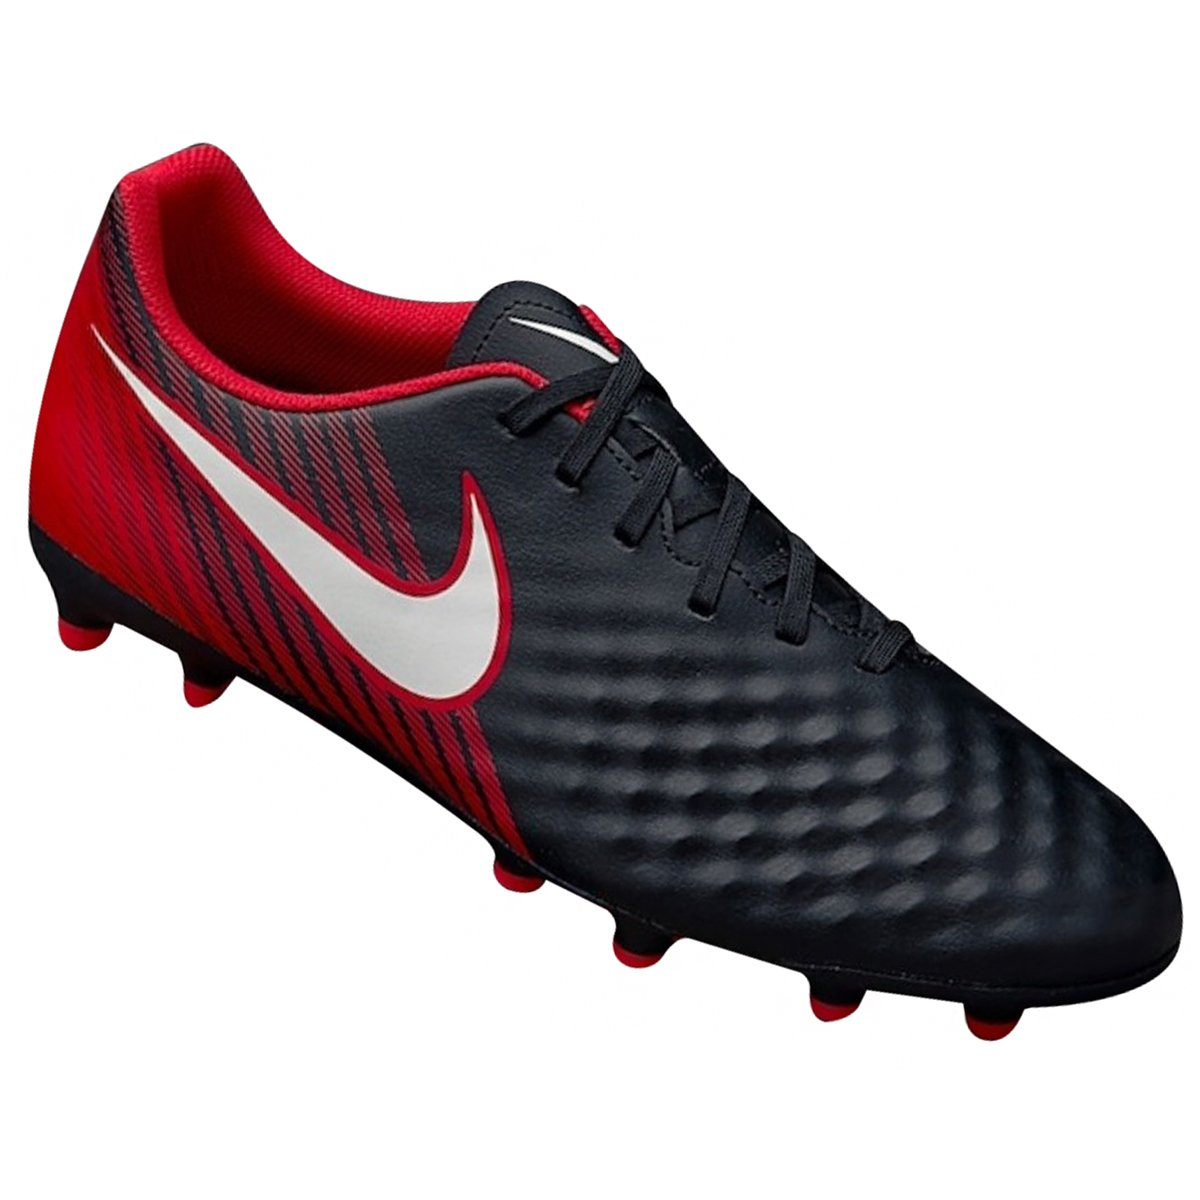 7eff2eac36 Chuteira Masculina Campo Nike Magista Ola II FG 844420-061 Preto Vermelho